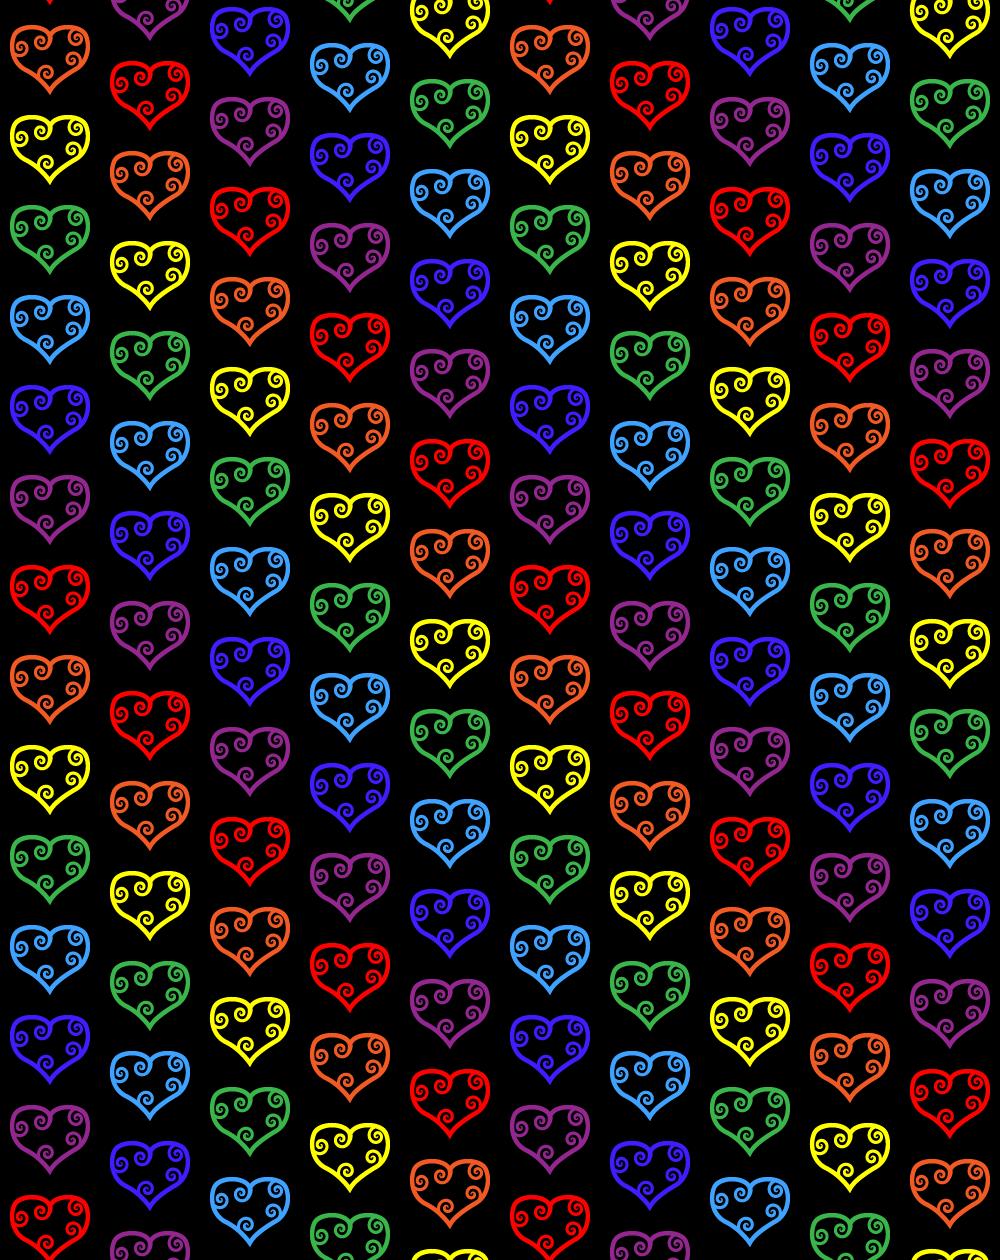 heartwallpaper3 ninth circle design